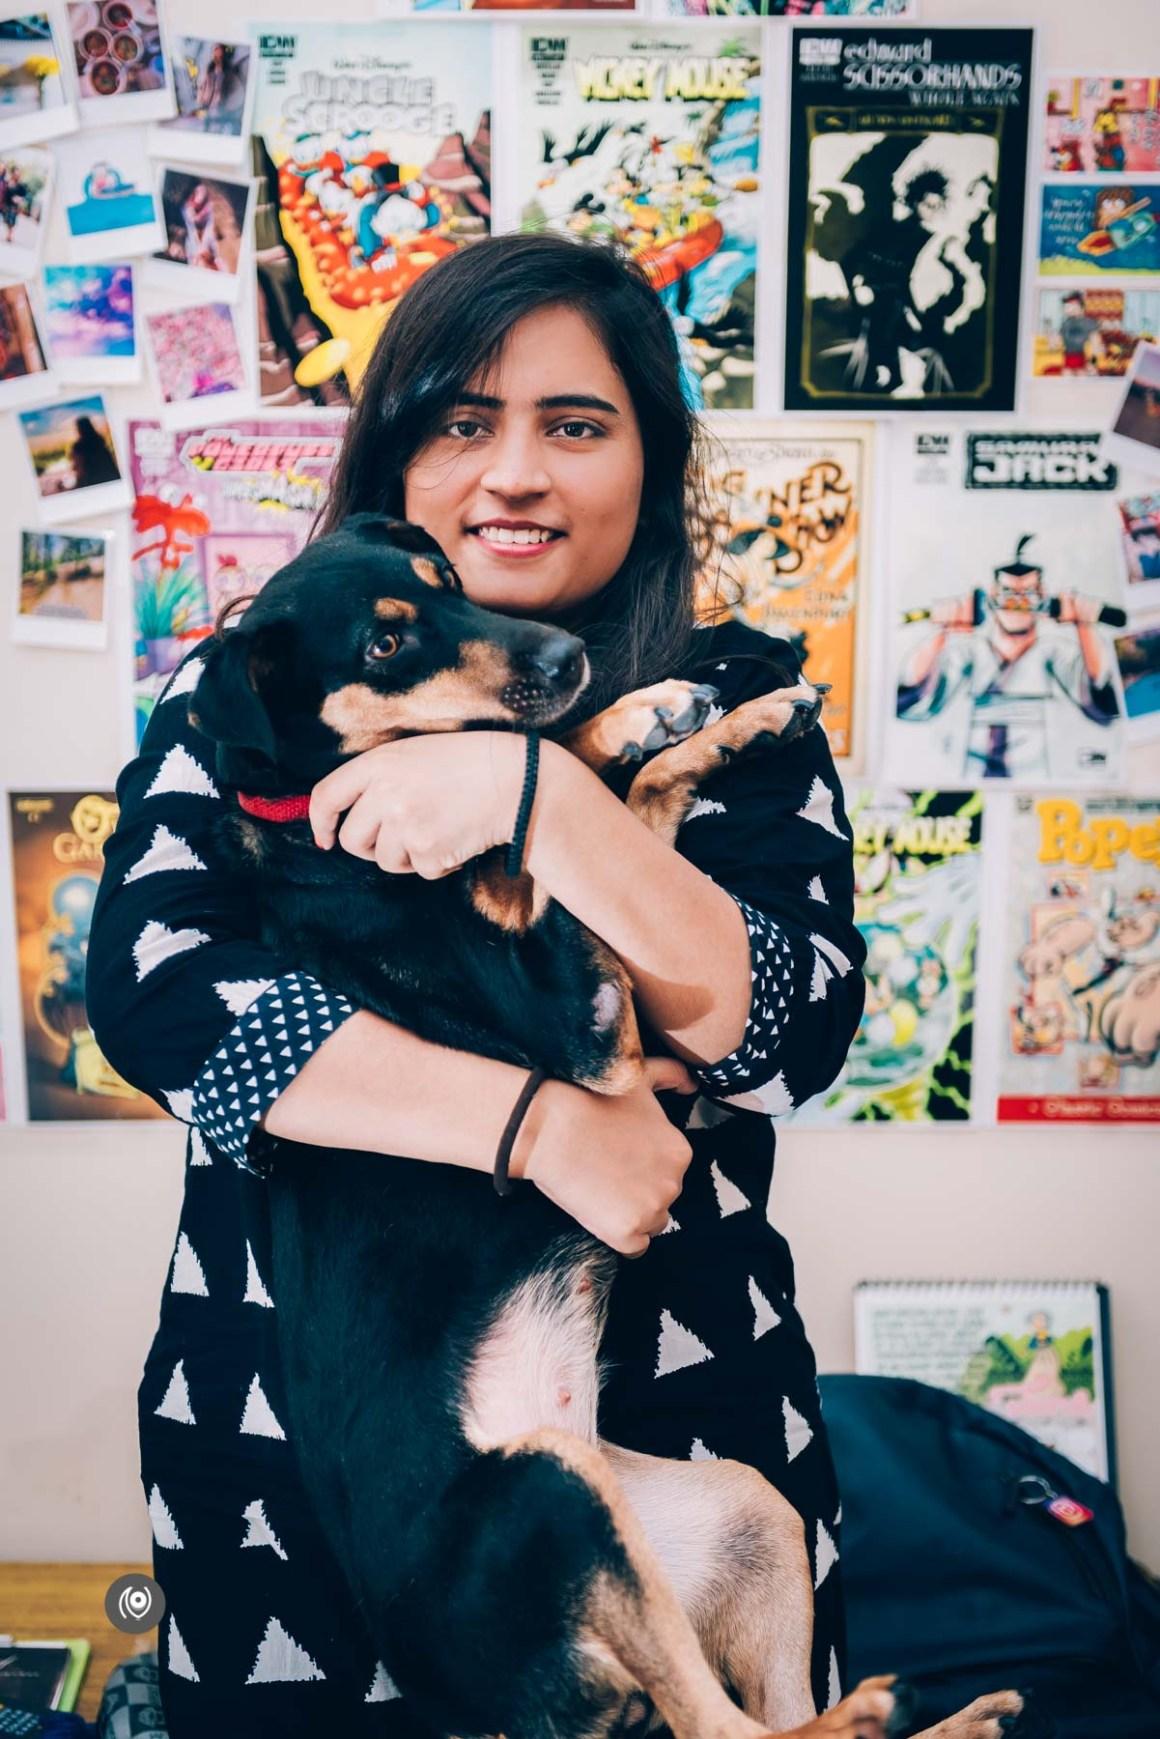 Naina Redhu, Photographer, Lifestyle Photographer, Portrait Photographer, Lifestyle Blogger, Photo Blogger, Photographer Blogger, Neha Sharma, Neha Doodles, Doodler, Illustrator, Graphic Designer, Minty, Home, A Day With, #EyesForPeople, #EyesForInfluencers